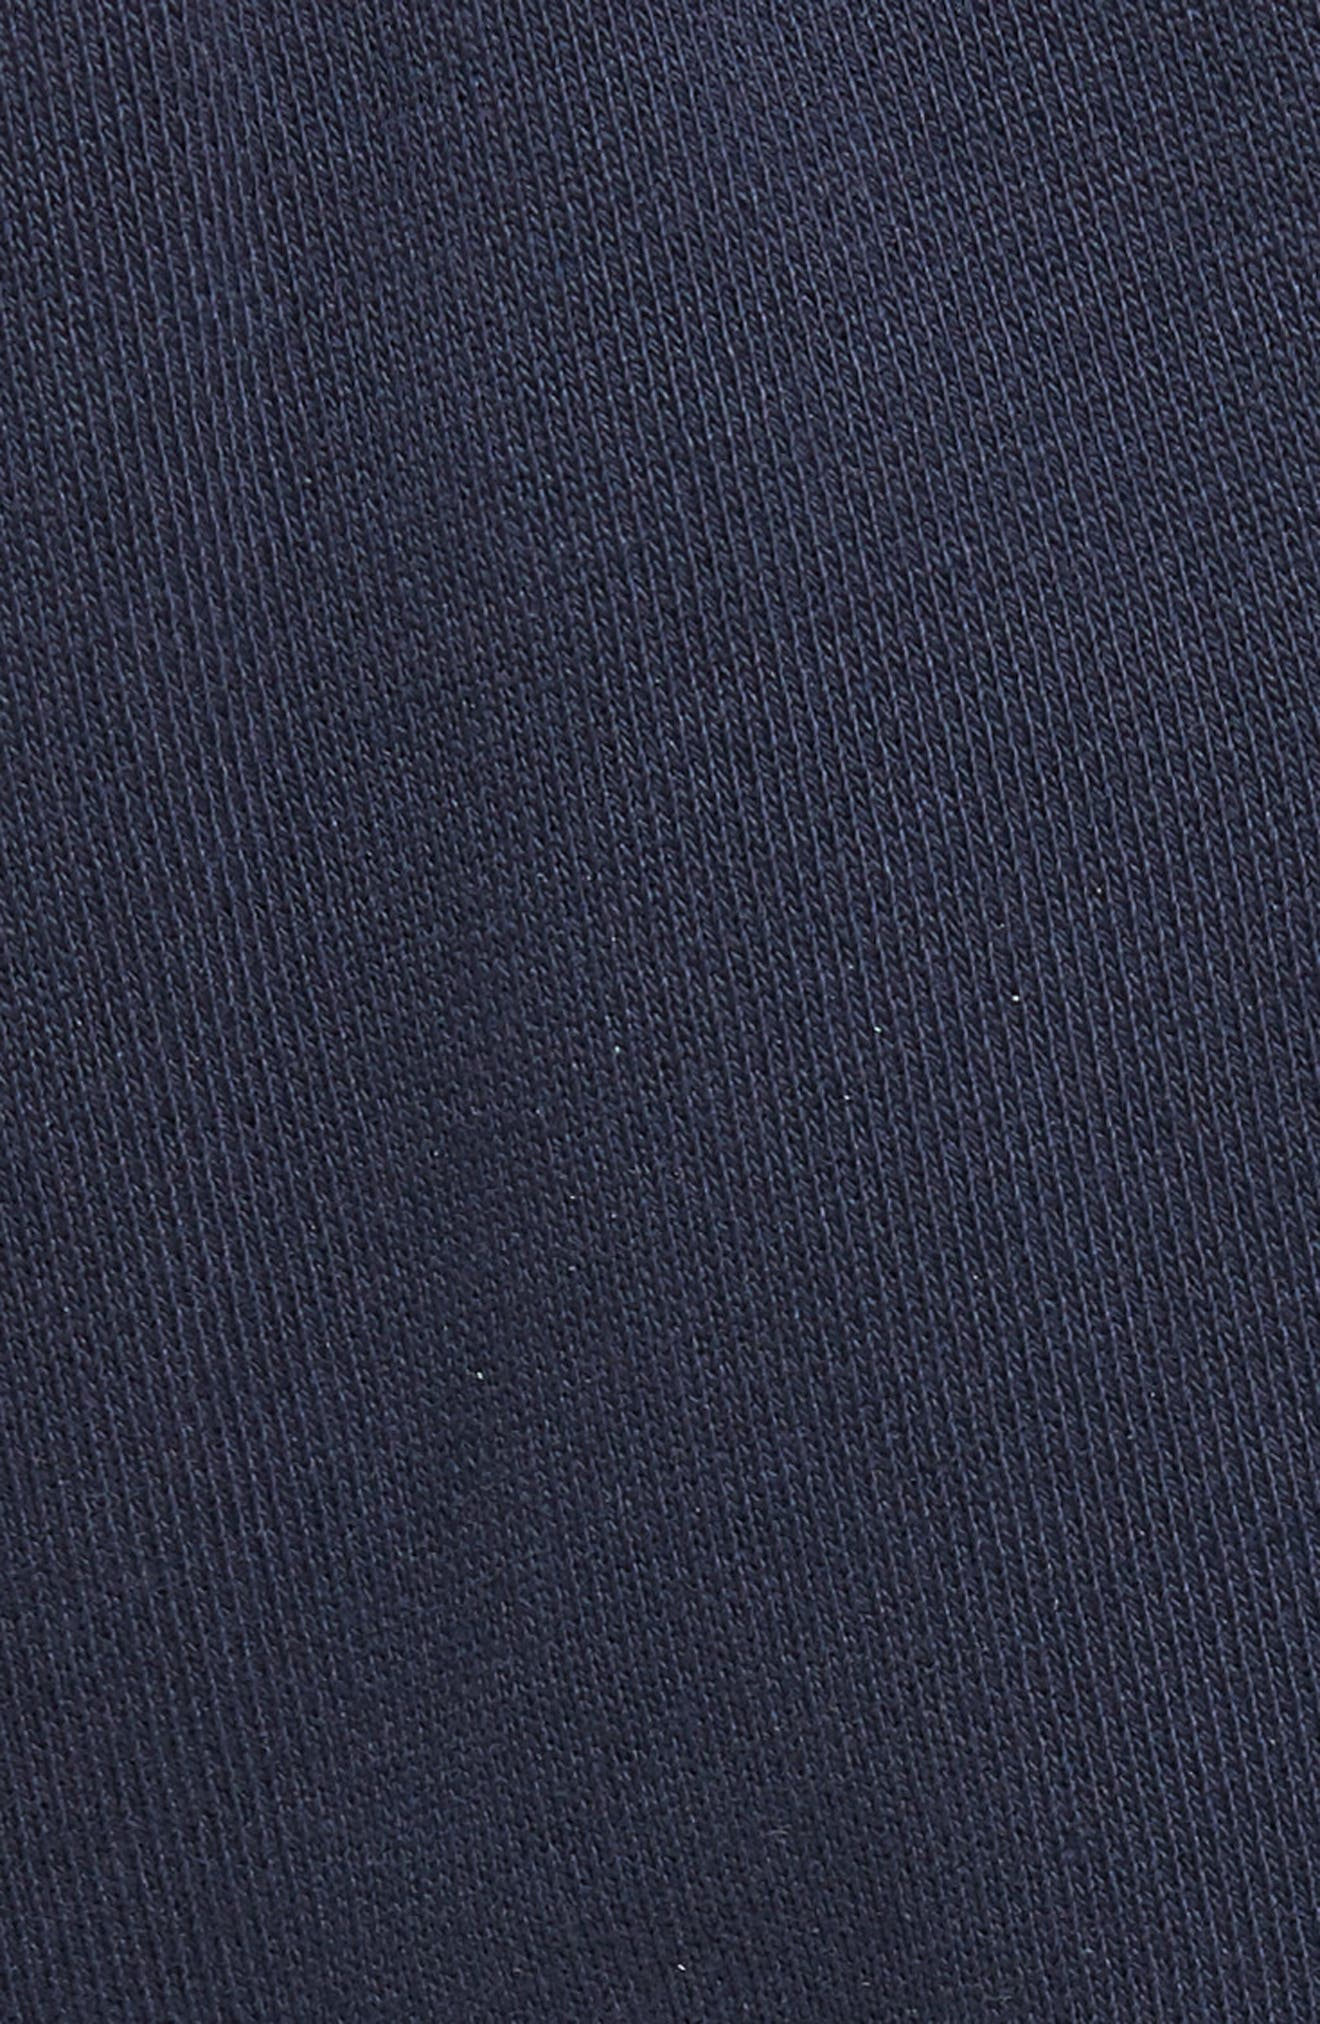 Lamont Snap Tab Sweatpants,                             Alternate thumbnail 5, color,                             Navy